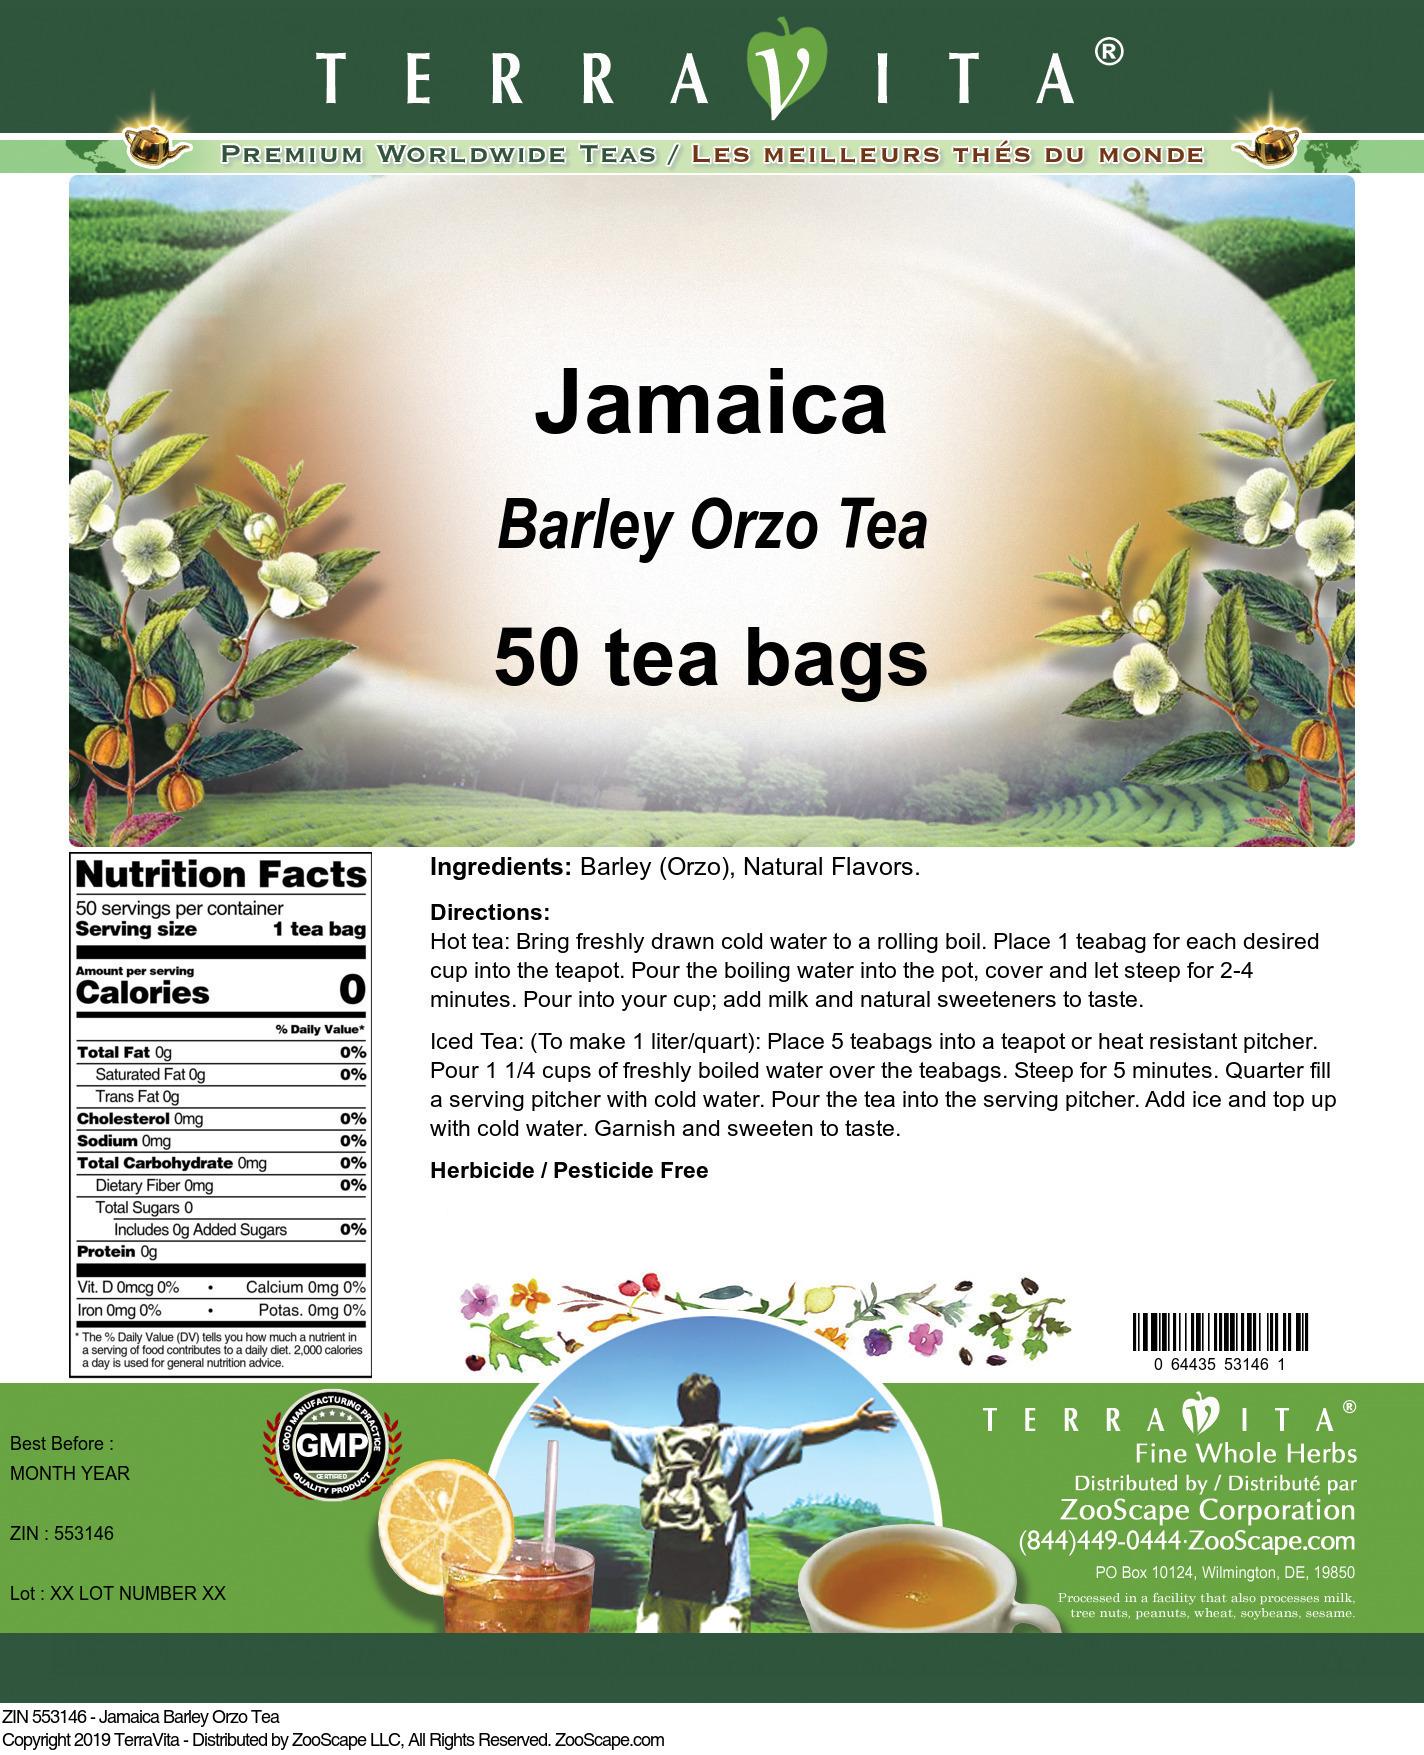 Jamaica Barley Orzo Tea